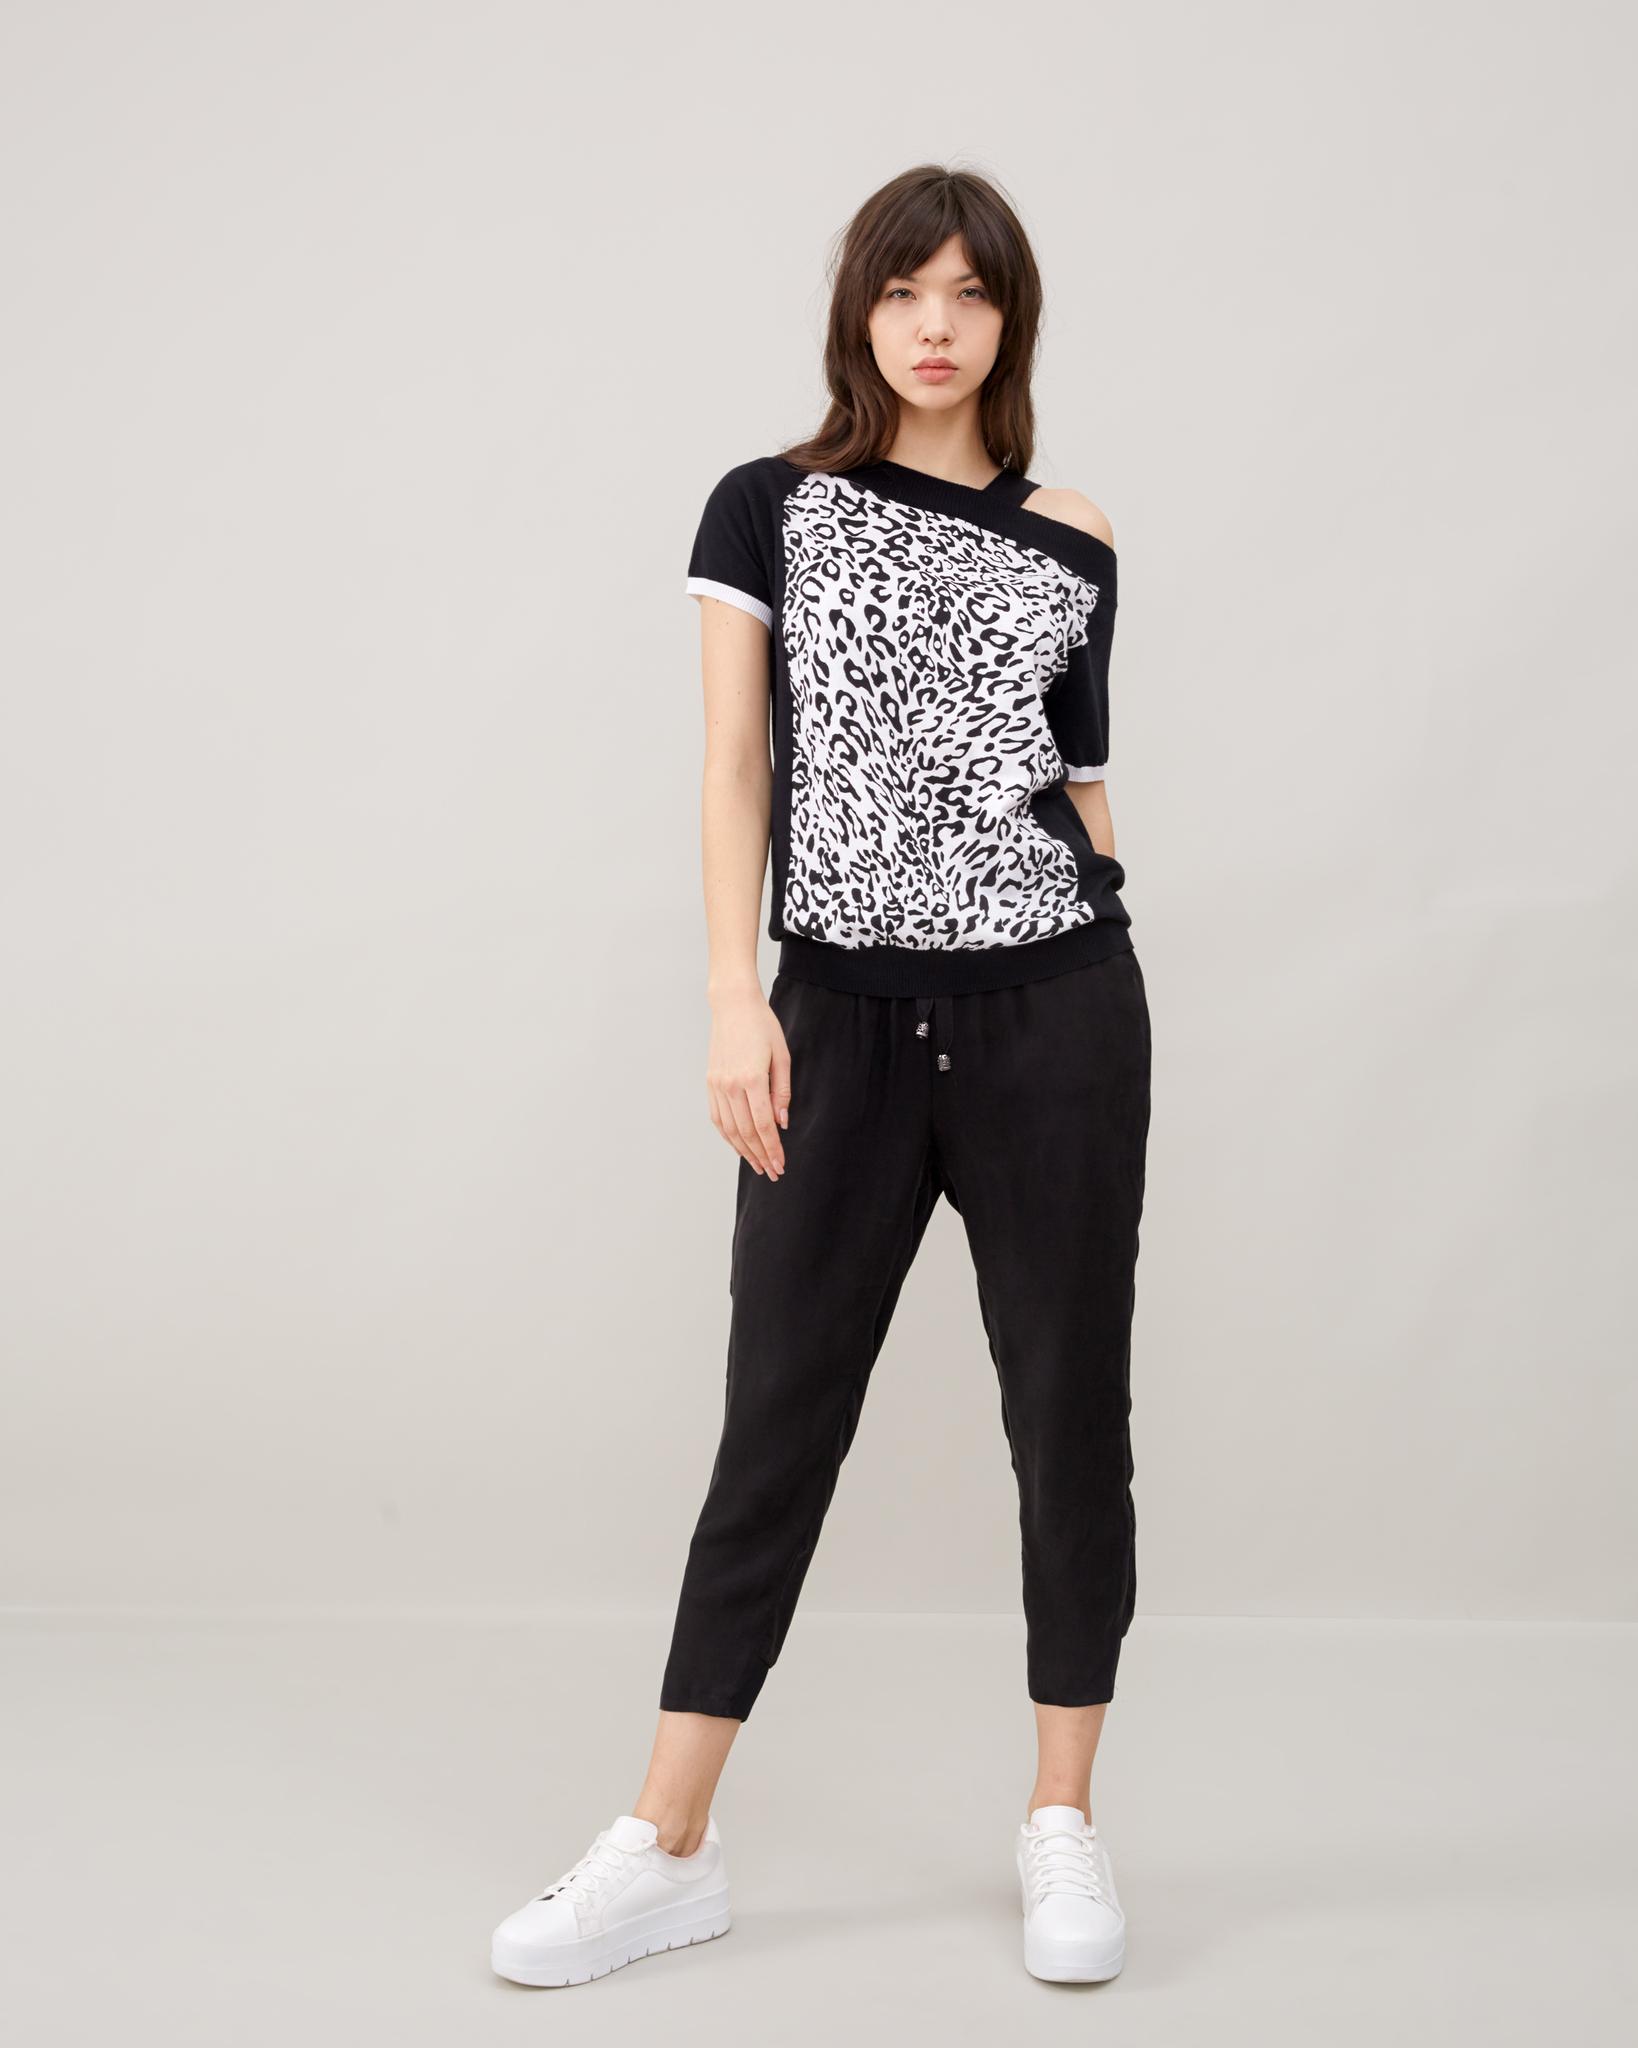 Блузки Блузка с одним плечом В-022 hass-leto23031.jpg